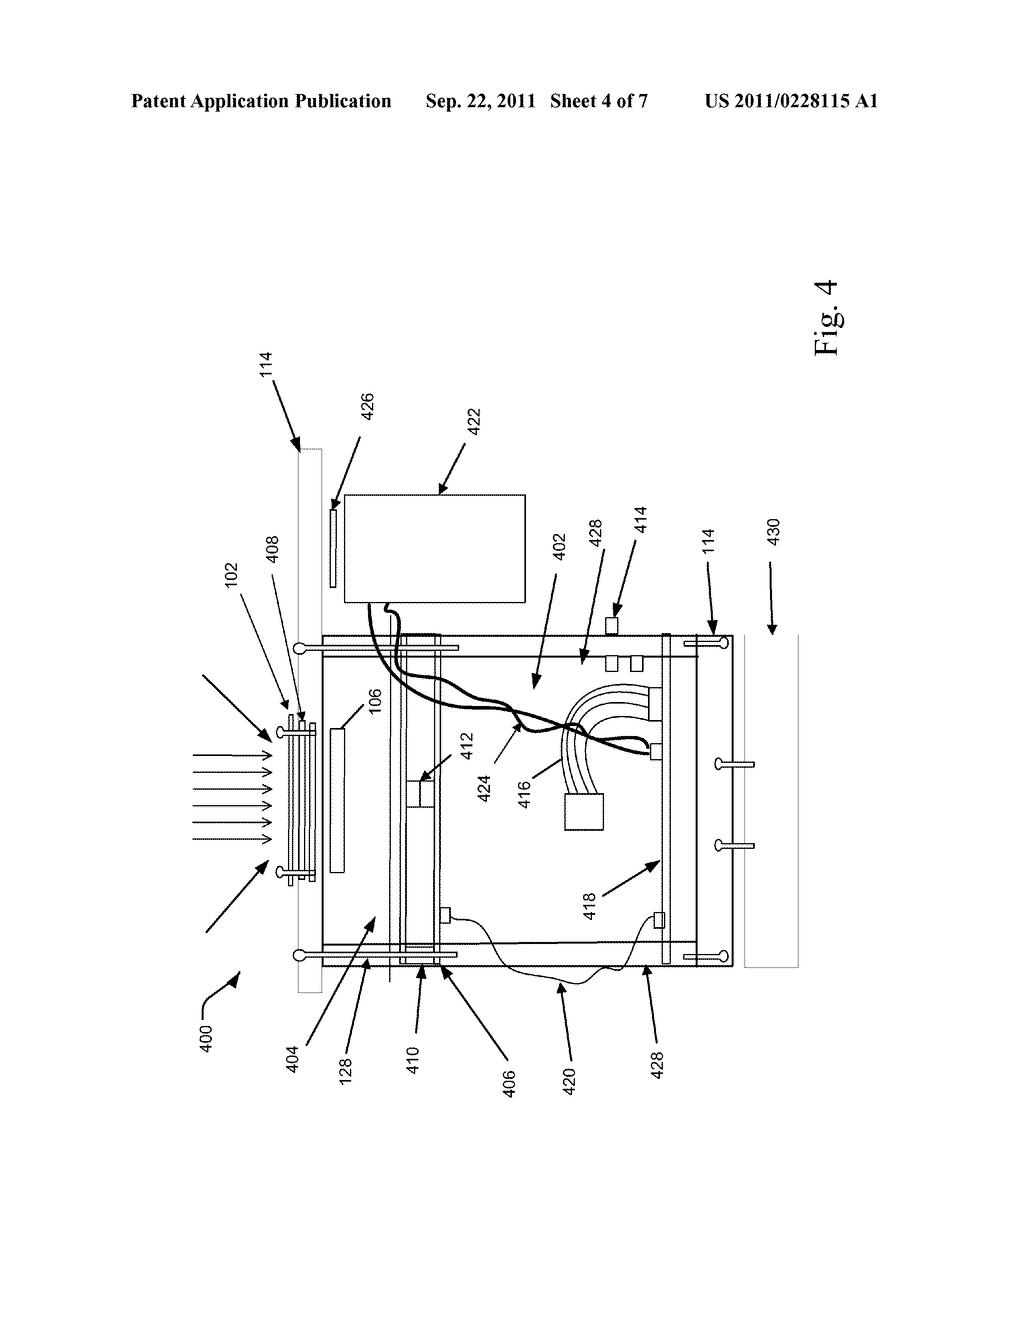 suzuki eiger 400 4x4 wiring diagram 2003 honda civic fuse panel ignition